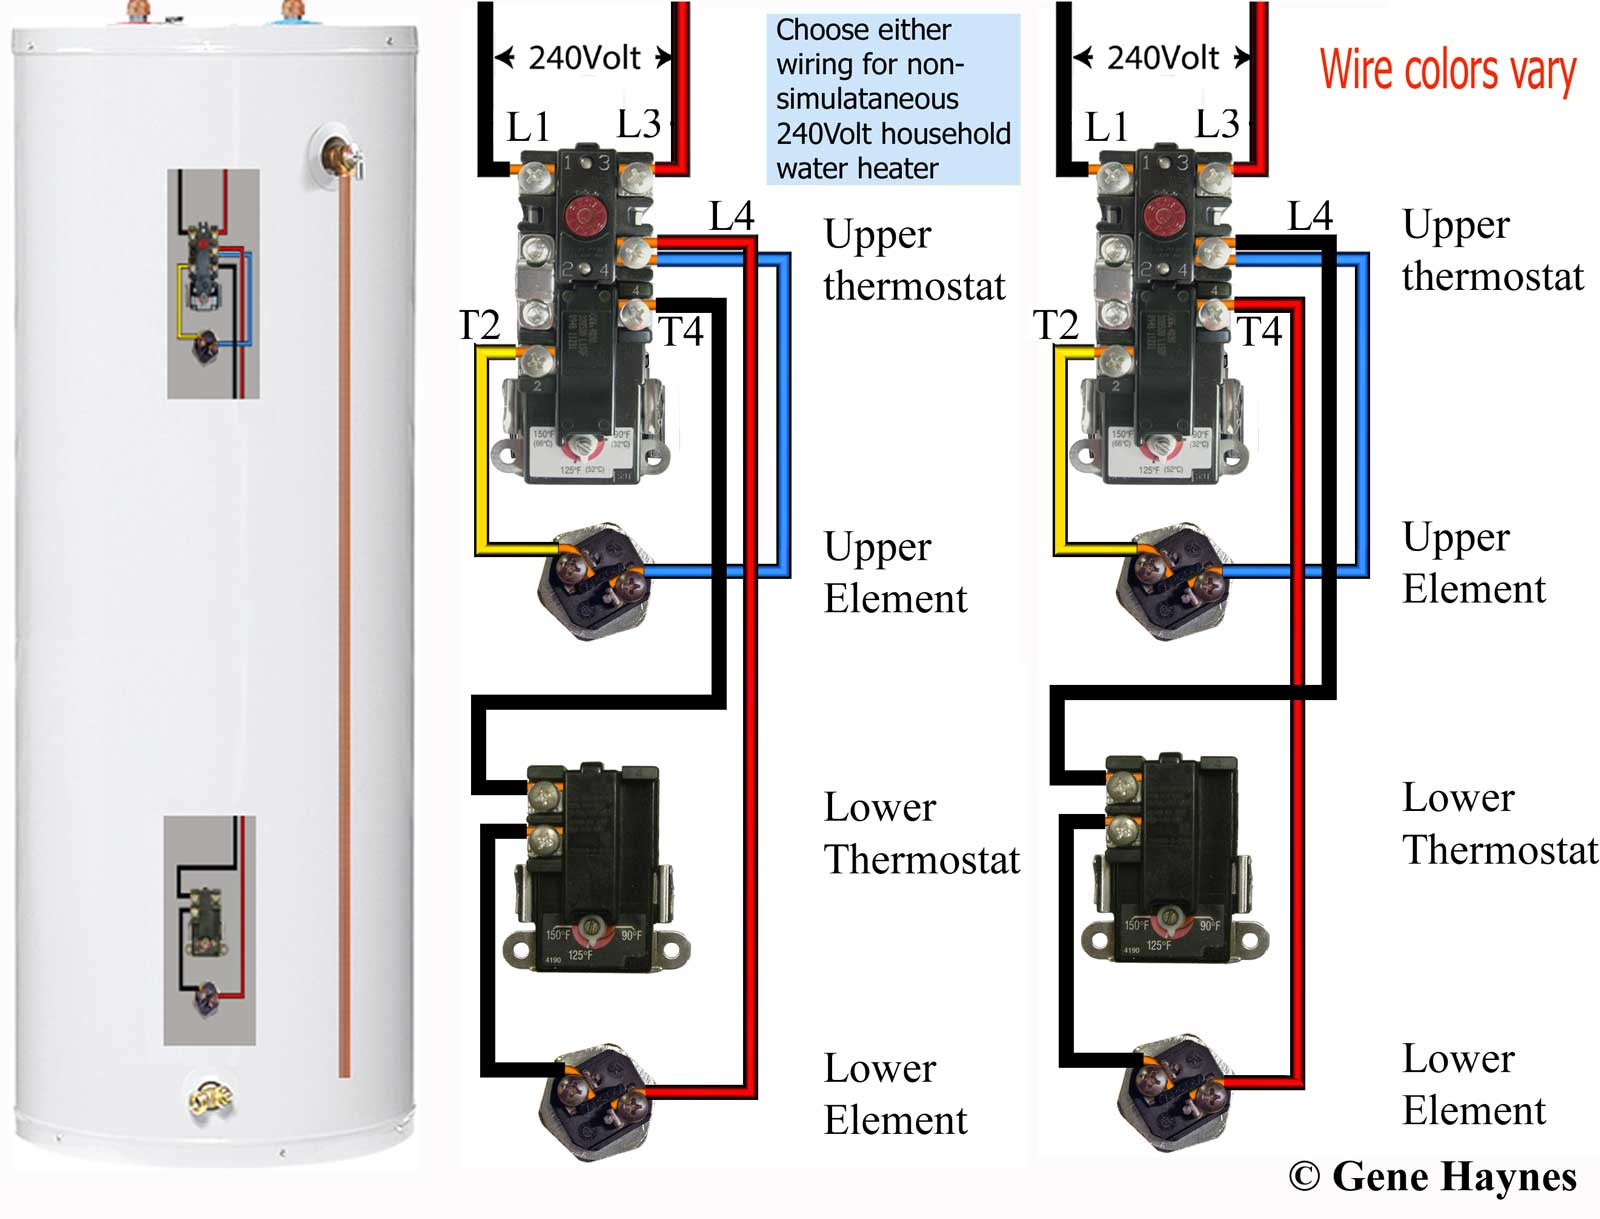 240V Water Heater Wiring Diagram | Manual E-Books - 240V Water Heater Wiring Diagram